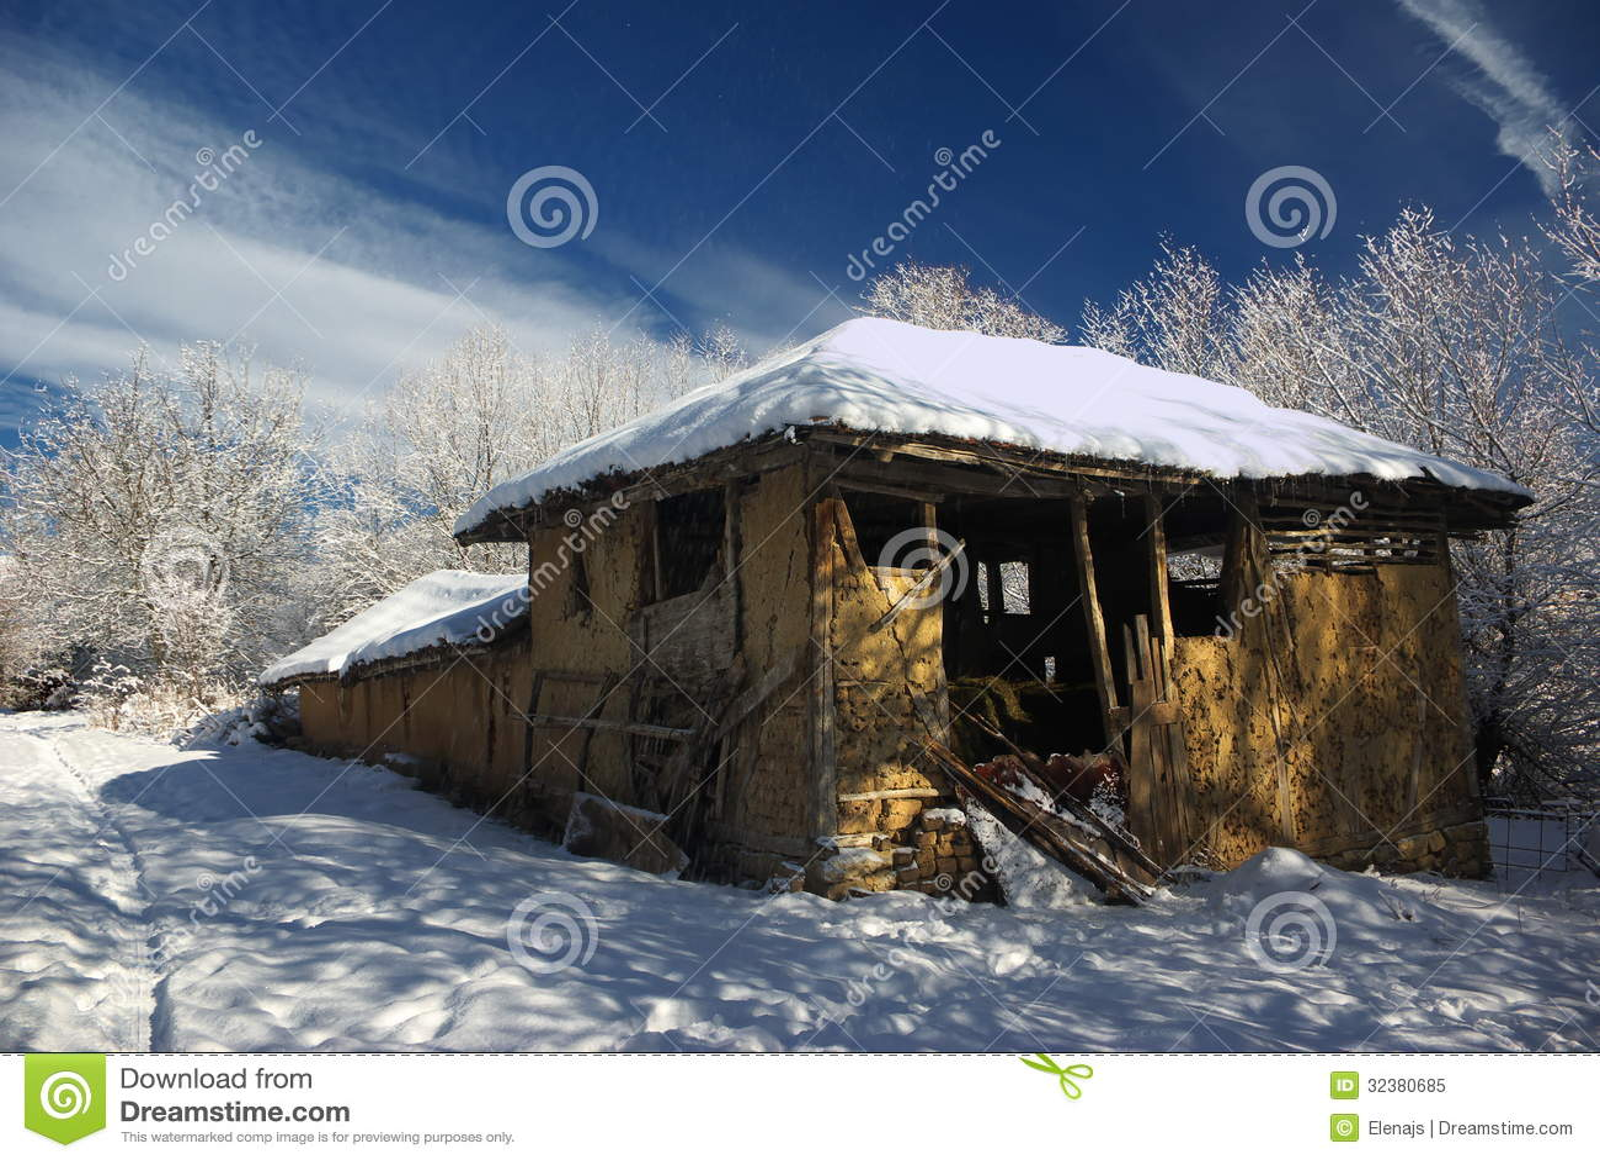 Nice House Design Program Free #1: Dilapidated-house-old-captured-winter-beautiful-sky-background-captured-sunny-winter-day-32380685.jpg